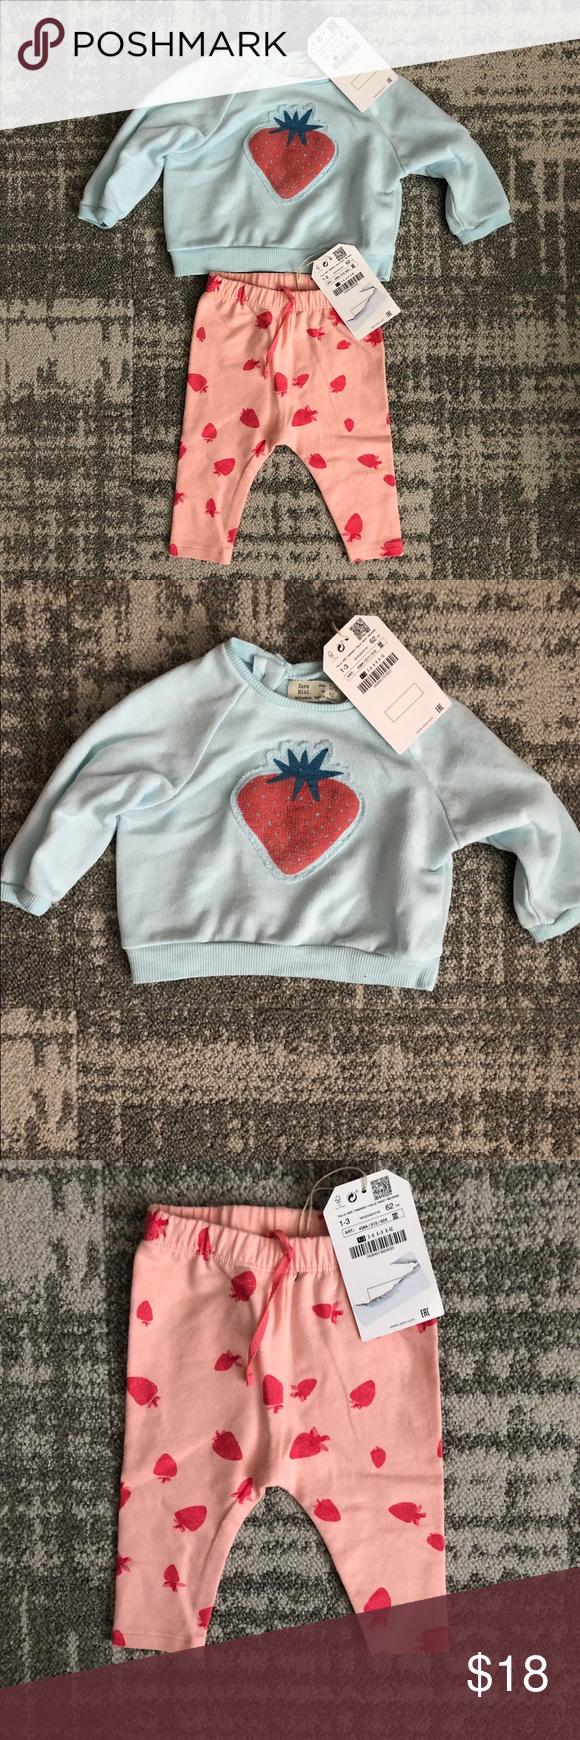 Nwt zara strawberry sweatshirt and leggings set nwt pinterest